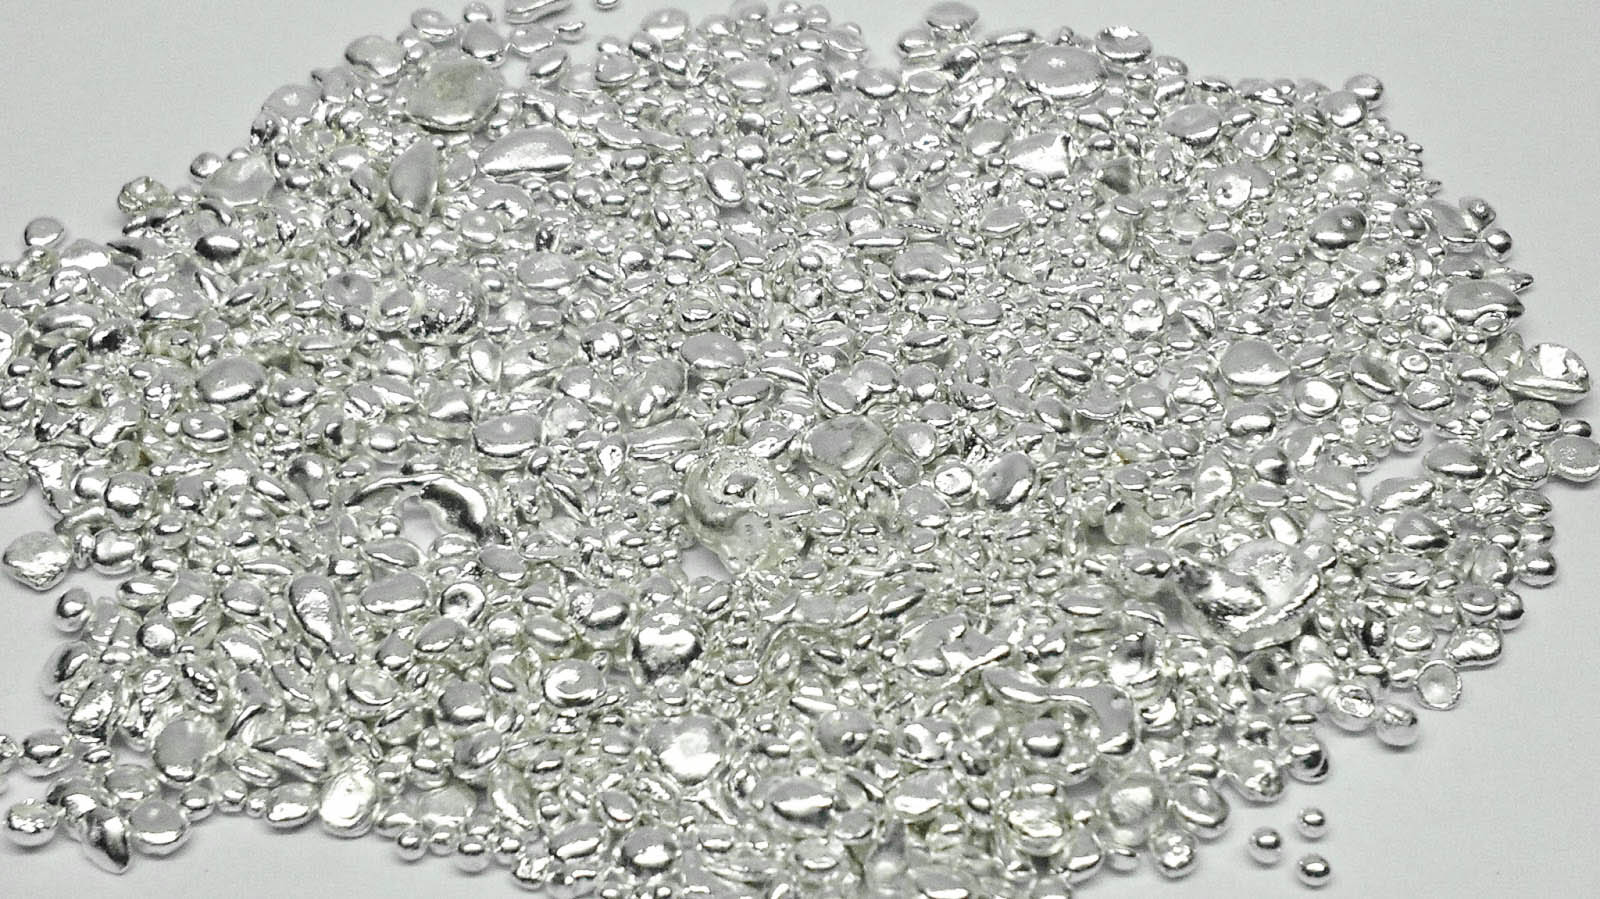 bijoux argent massifpeut on faire allergie nickel